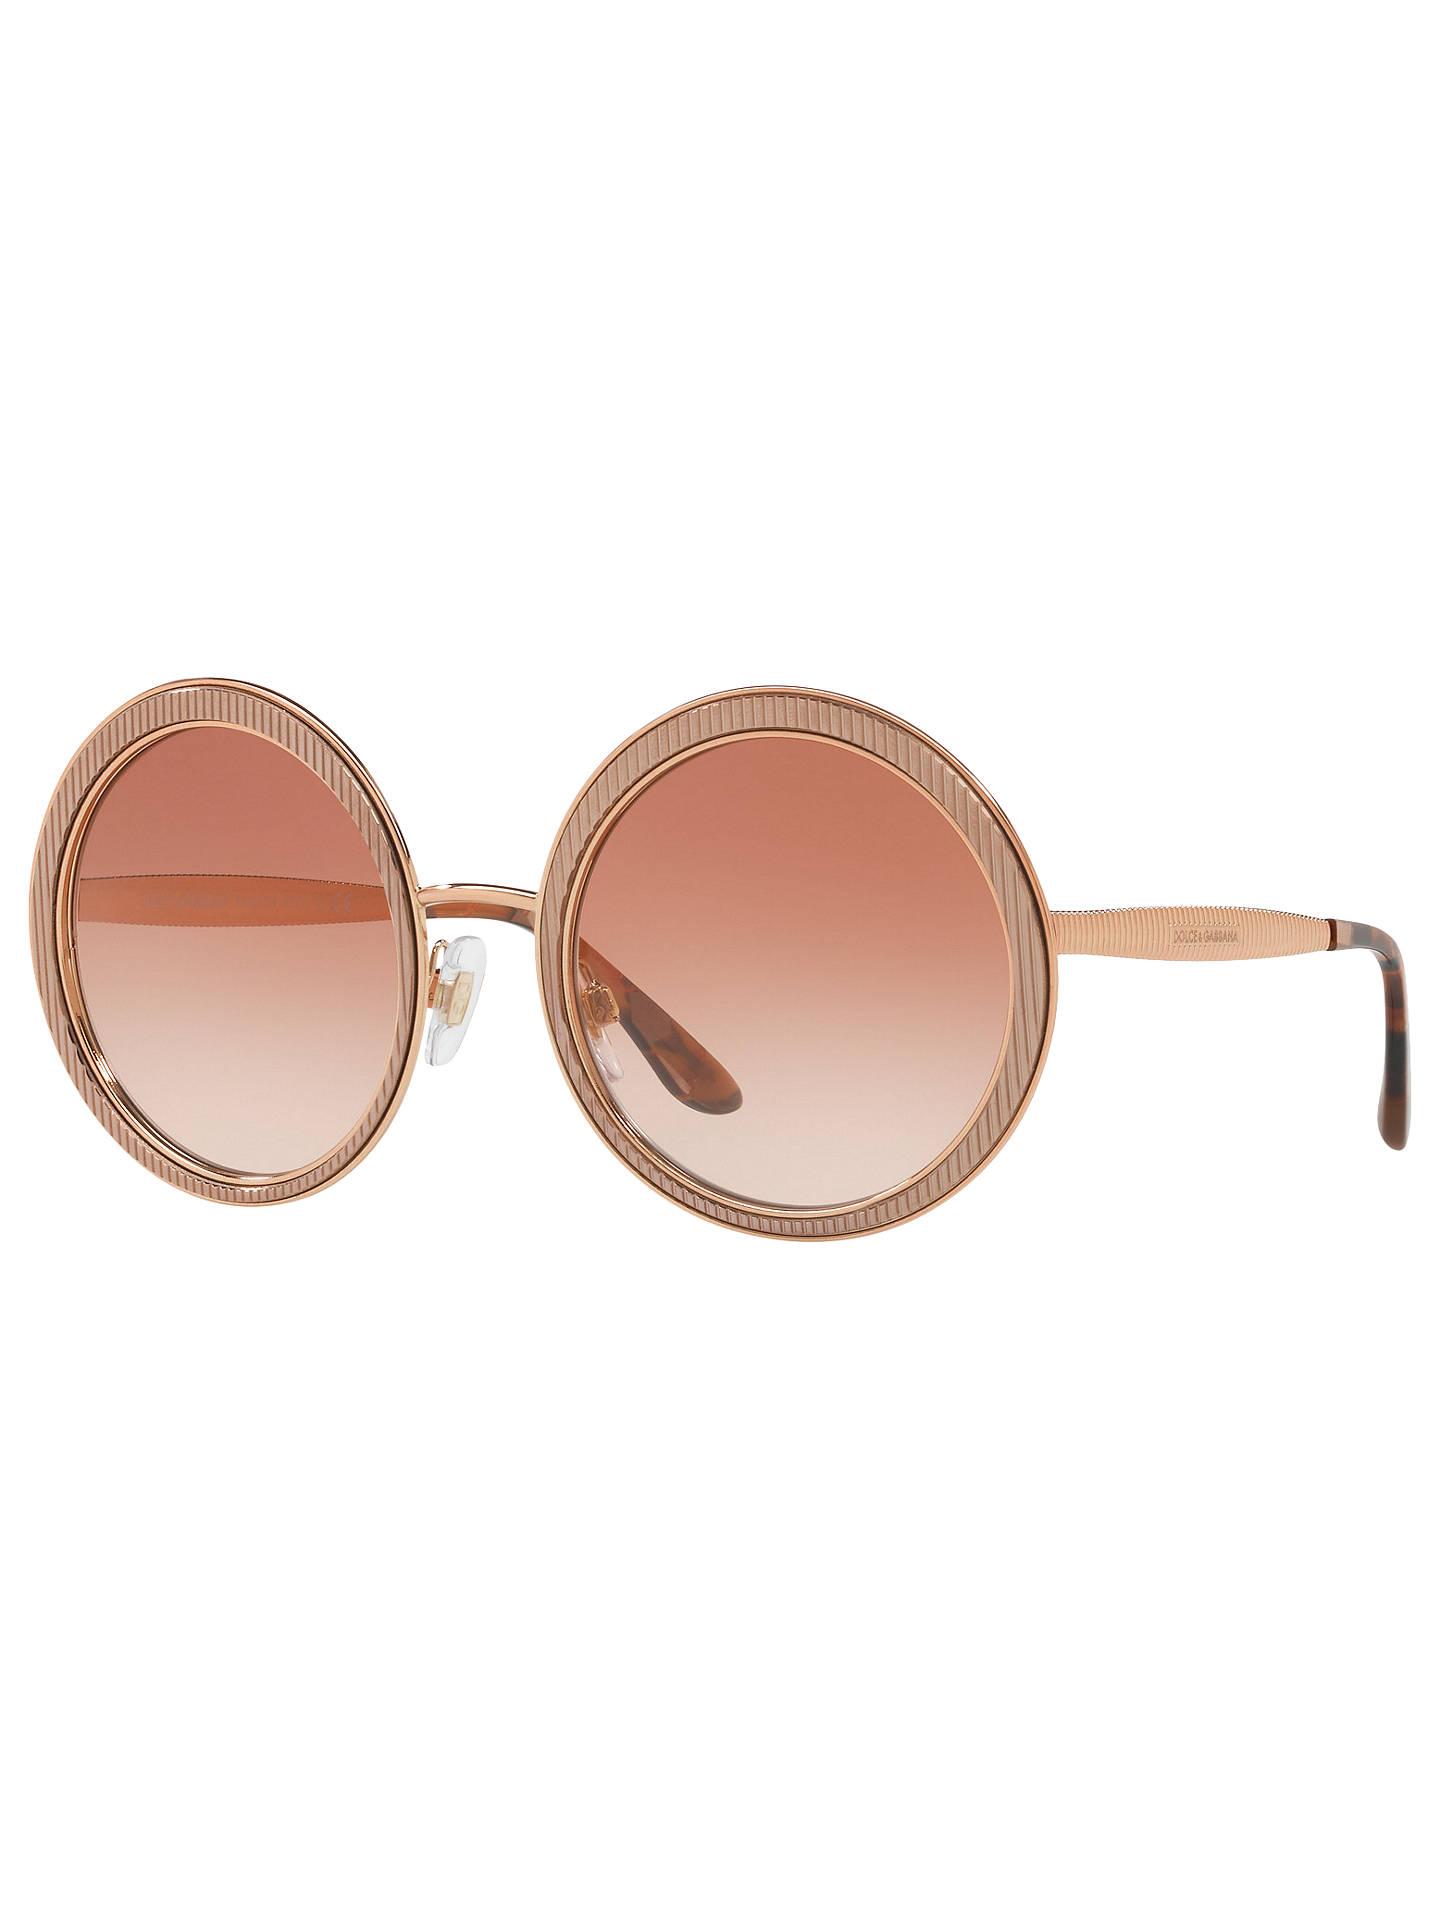 6c45f7ce1c15 Dolce   Gabbana DG2179 Women s Textured Round Sunglasses at John ...